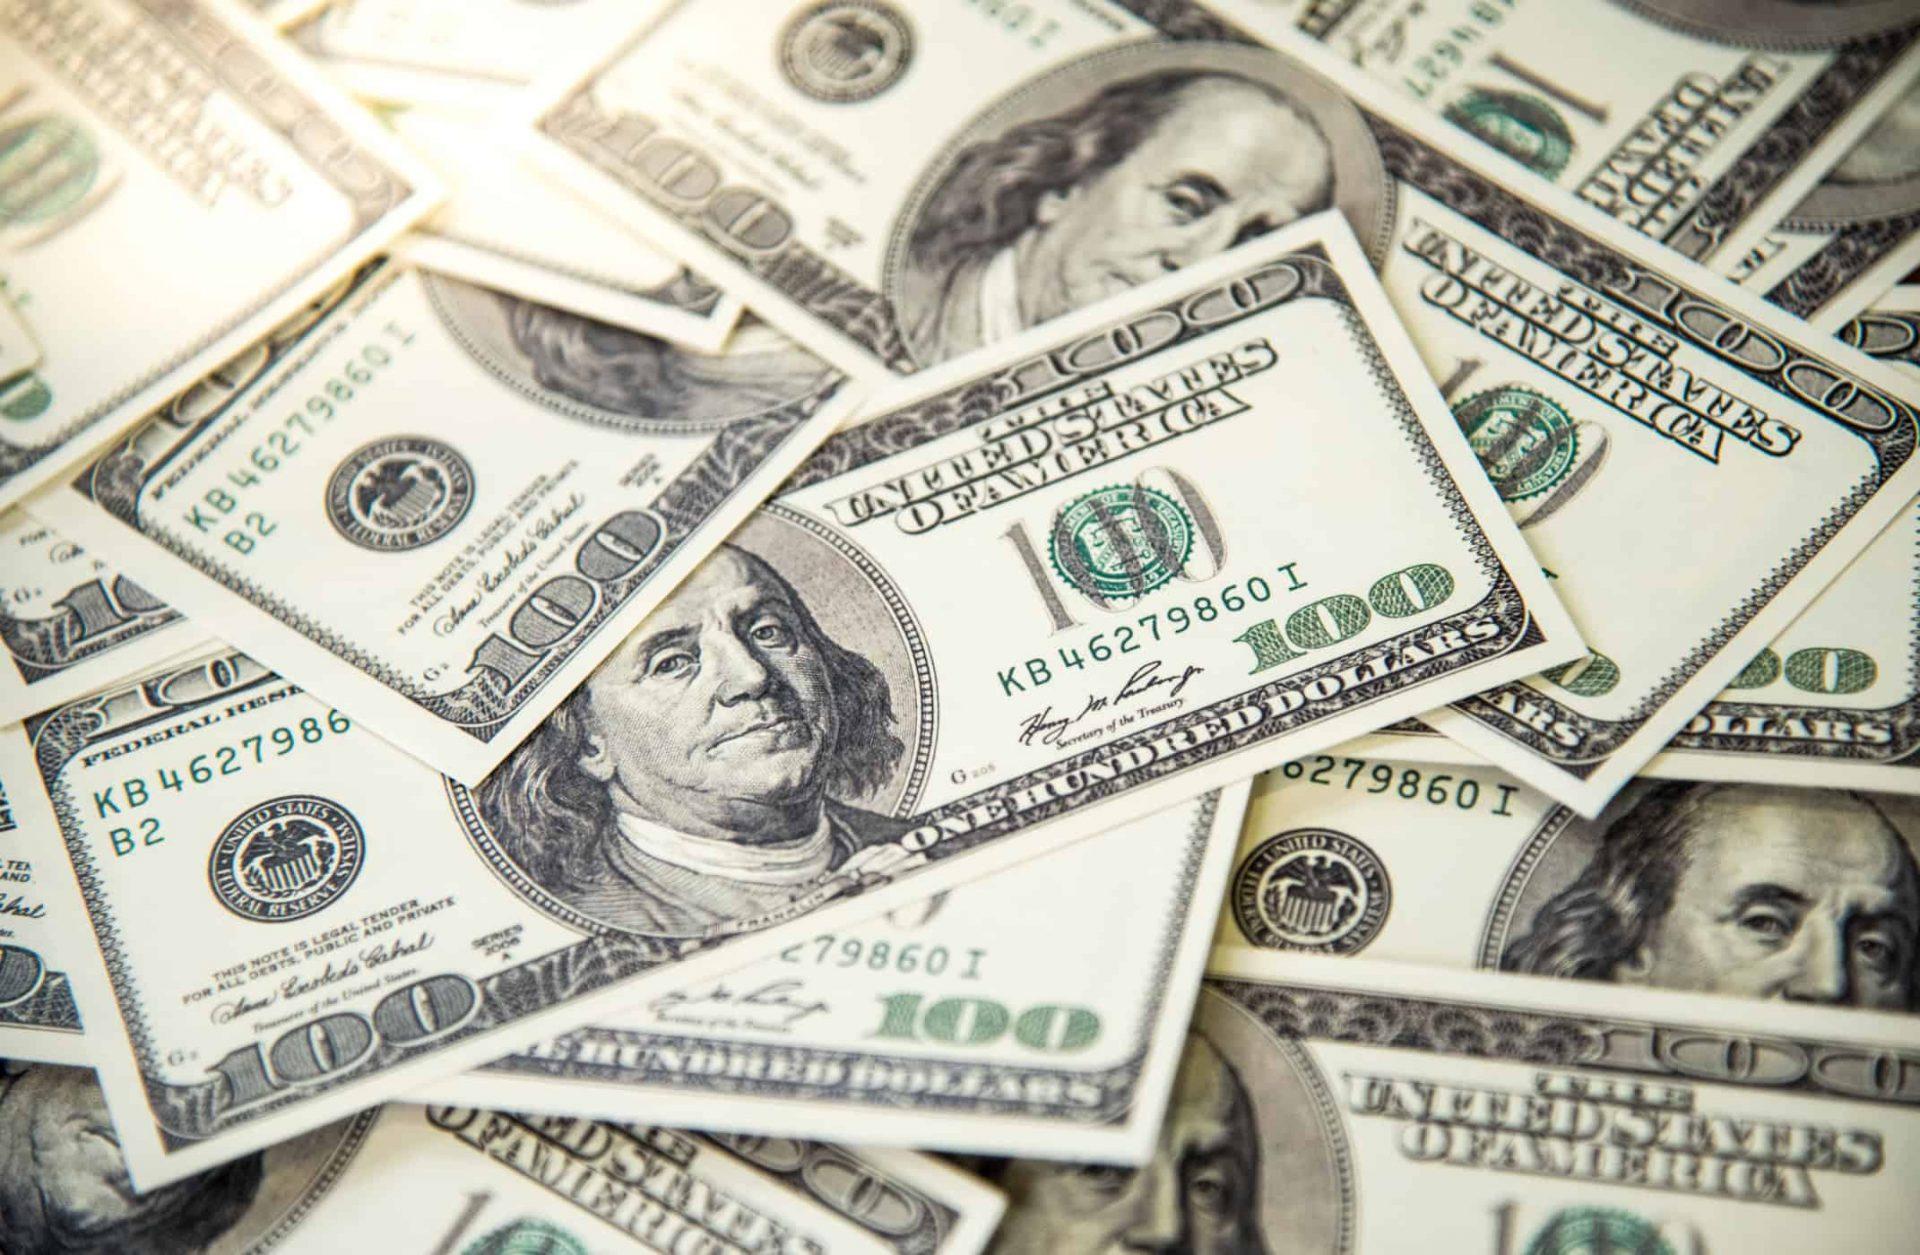 cbdoil.com sells for $500,000